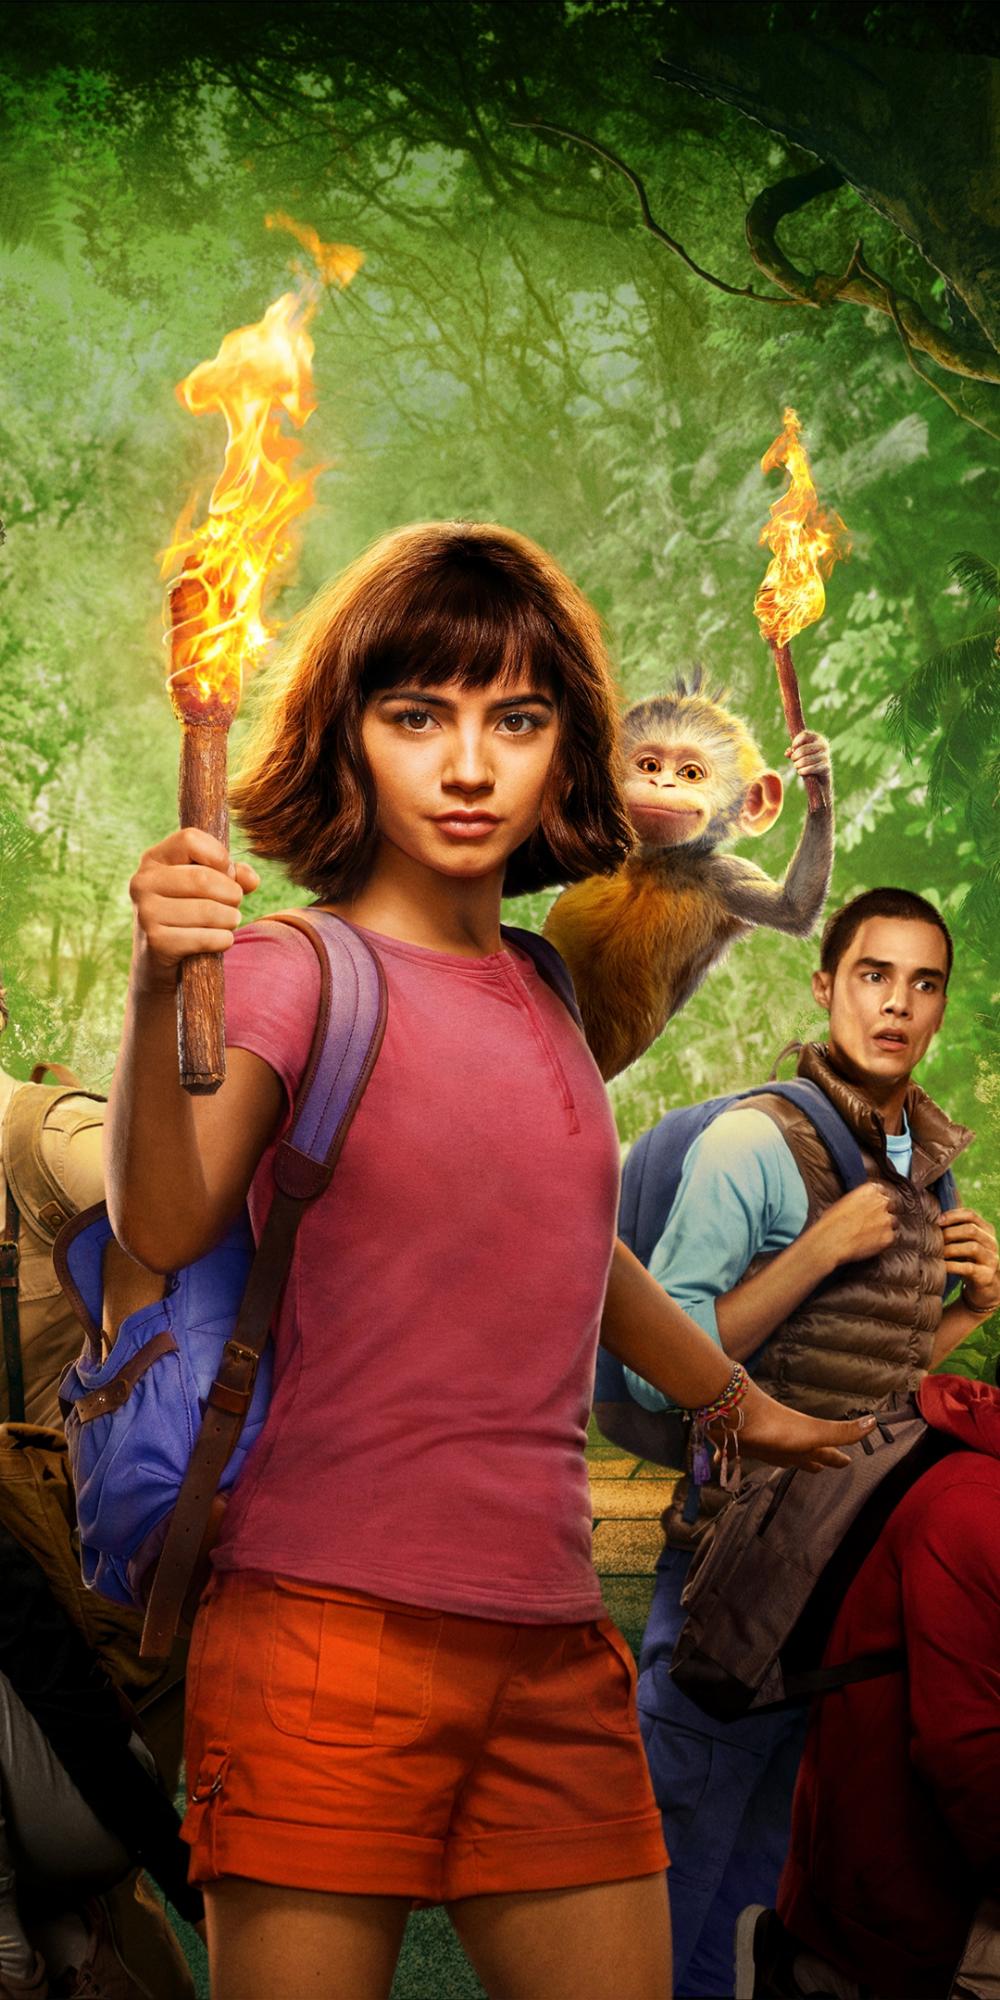 1080x2160 Dora The Explorer Dora And The Lost City Of Gold 2019 Movie Wallpaper Lost City Of Gold Dora The Explorer Dora Movie